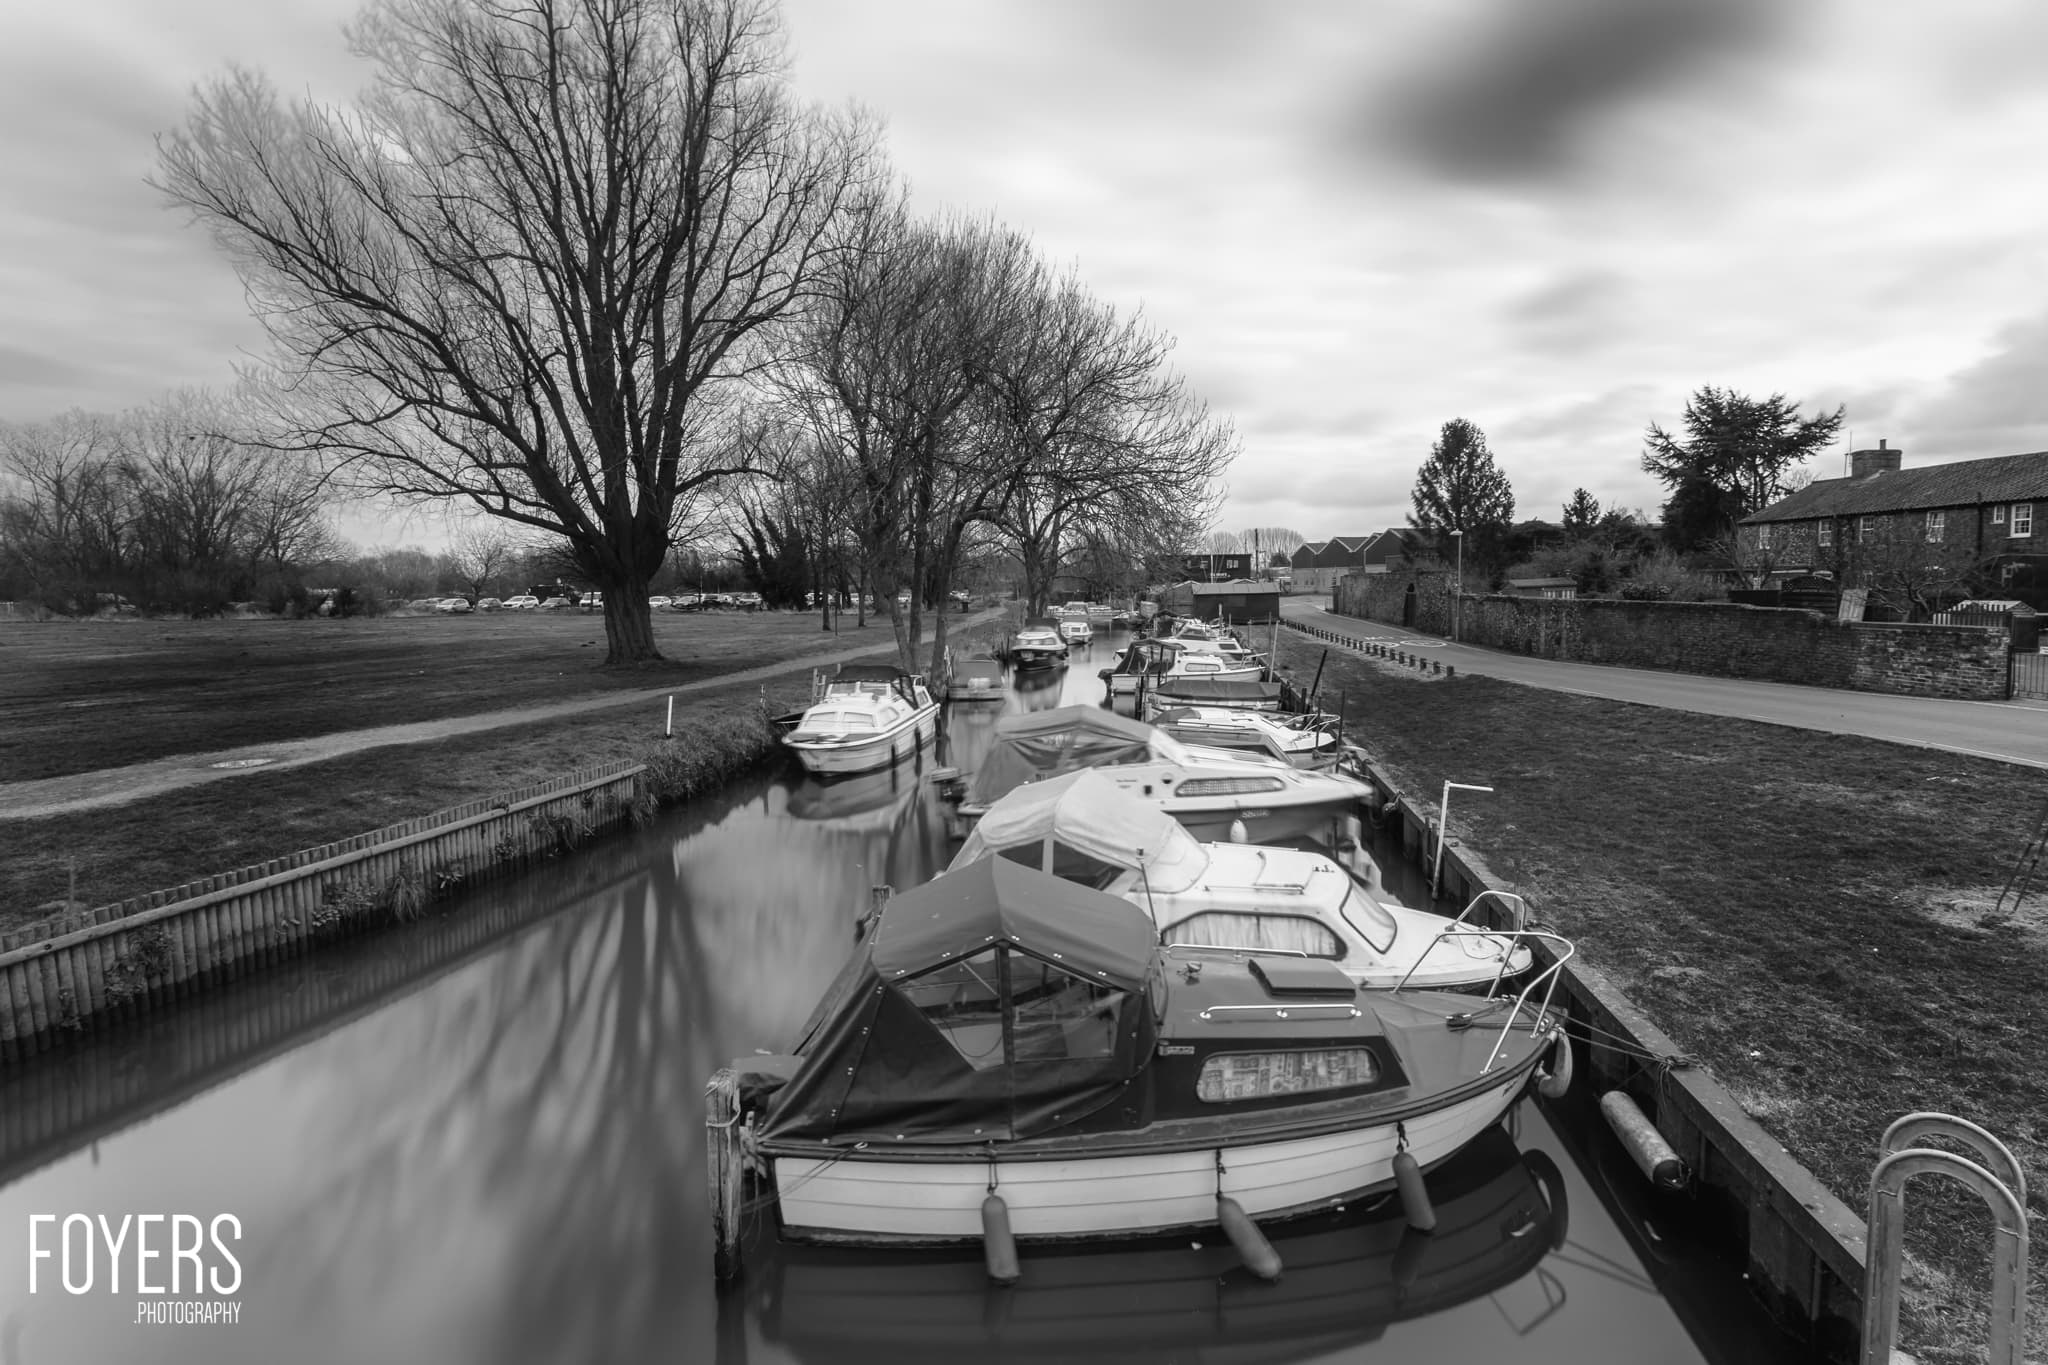 beccles suffolk boats-5812-Edit - copyright - Robert Foyers